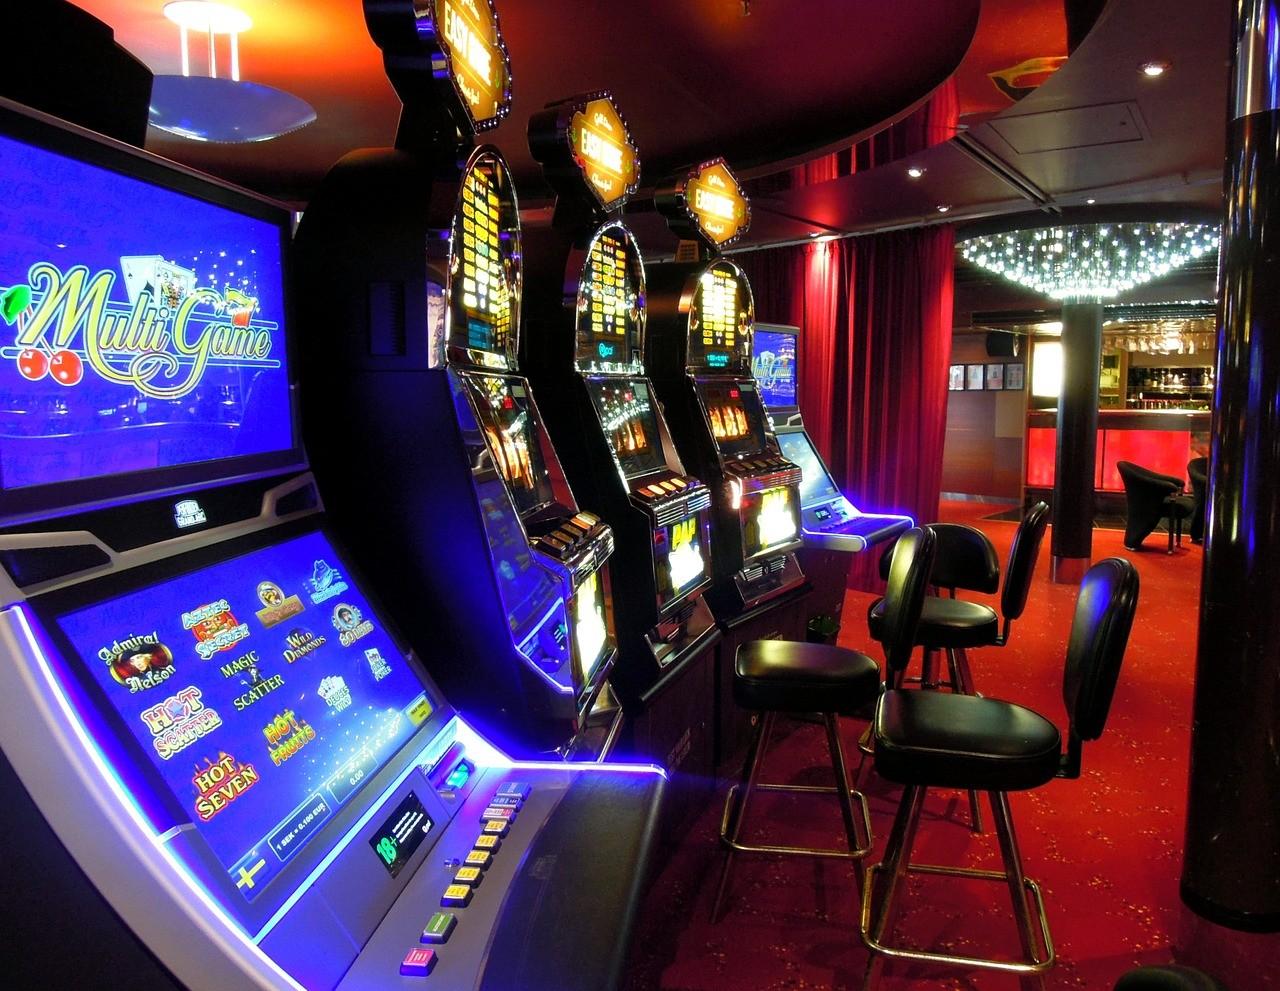 Spielautomaten, Casino, Automatenspiel